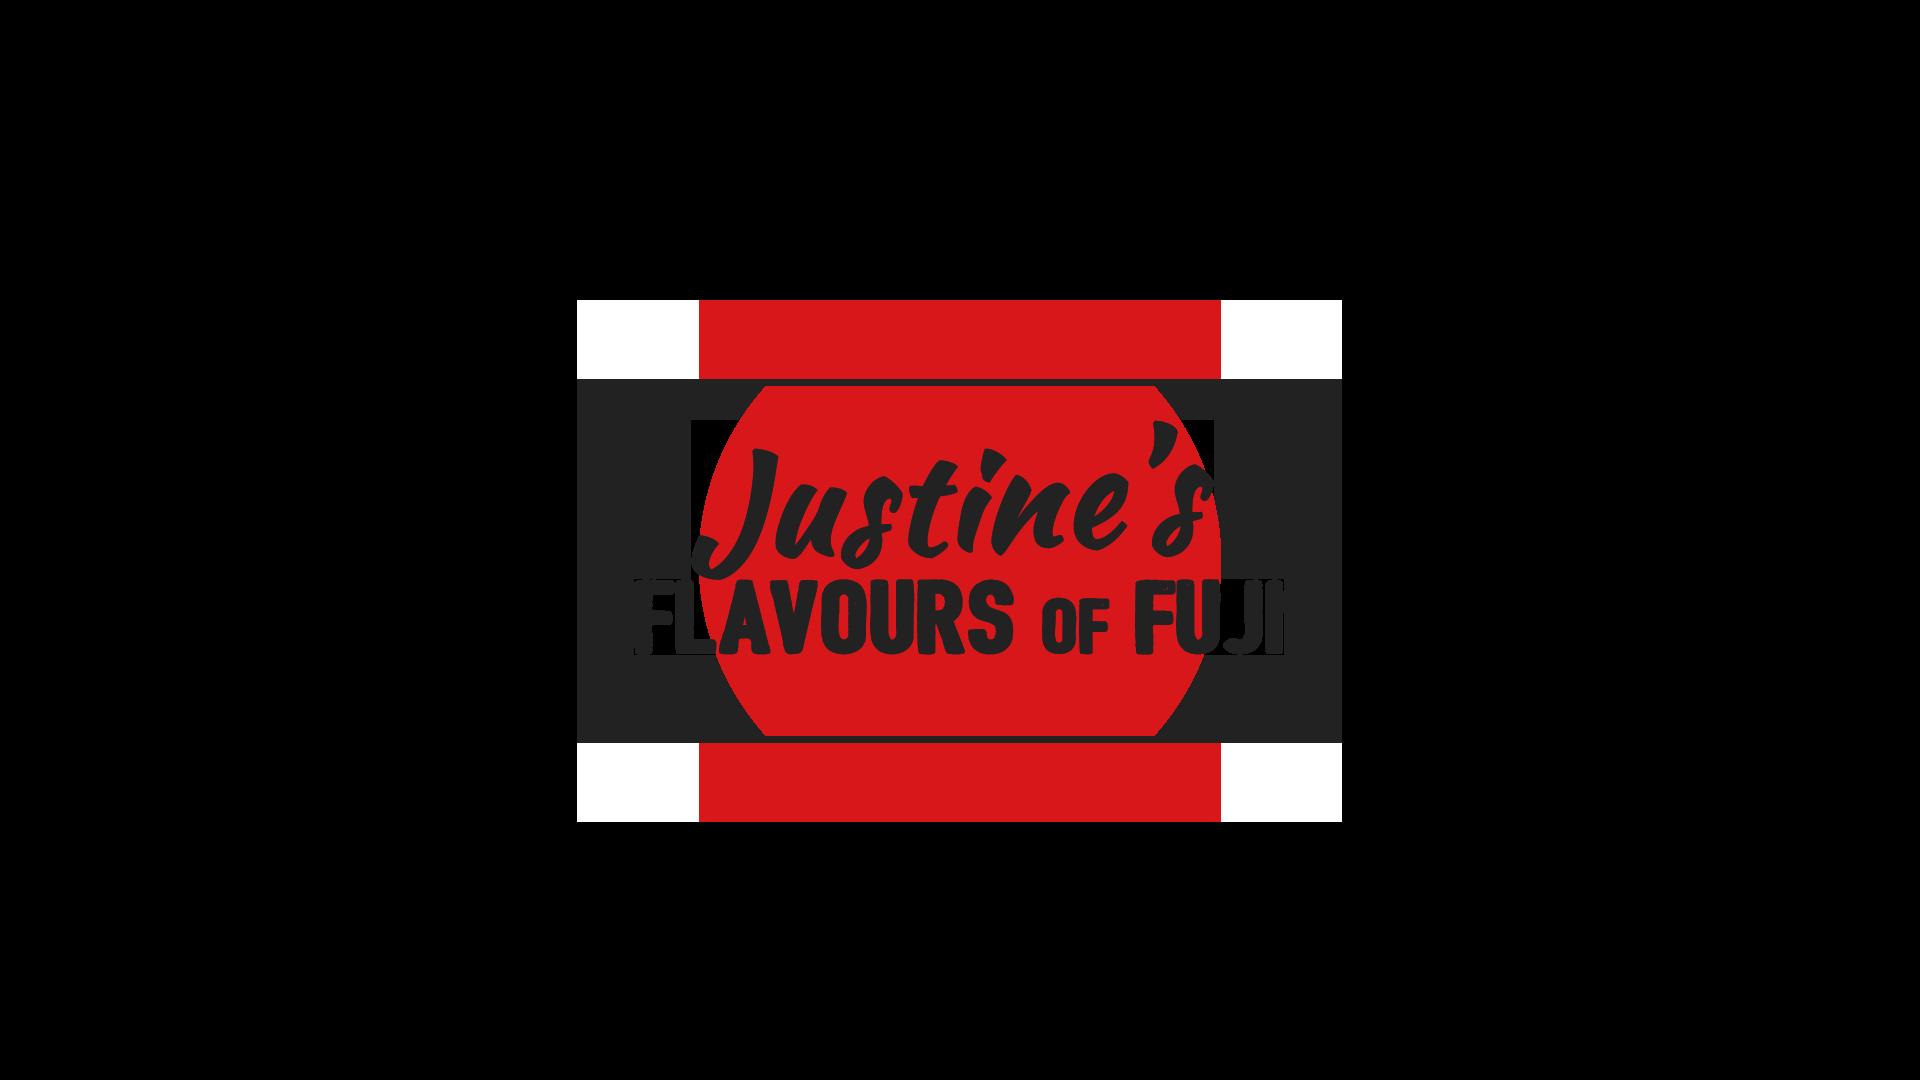 Justines Flavours Of Fuji Logo Grey